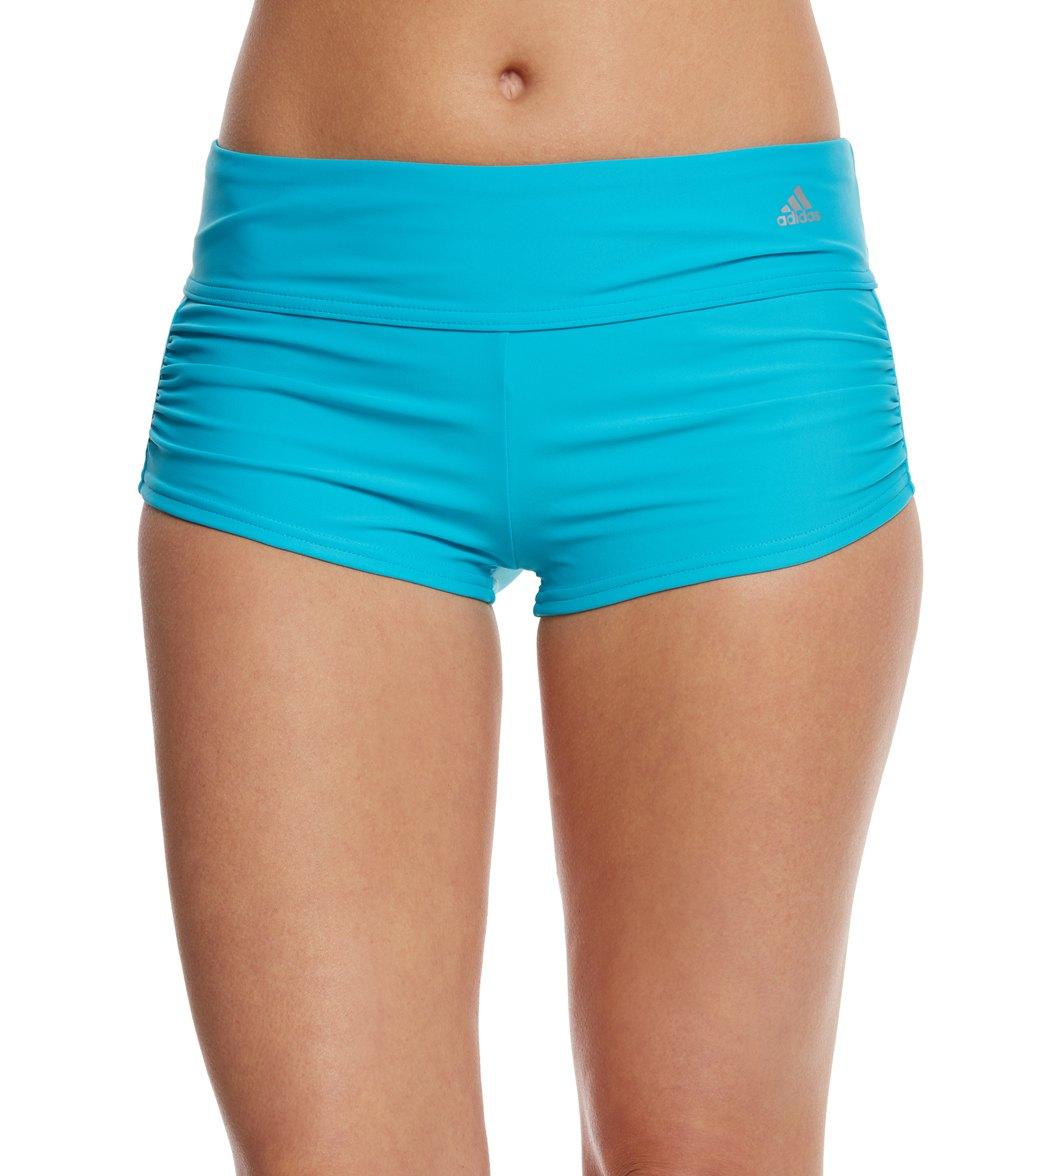 f34df68283c40 ... Adidas Women's Solid Start Shirred Swim Short. Play Video. MODEL  MEASUREMENTS